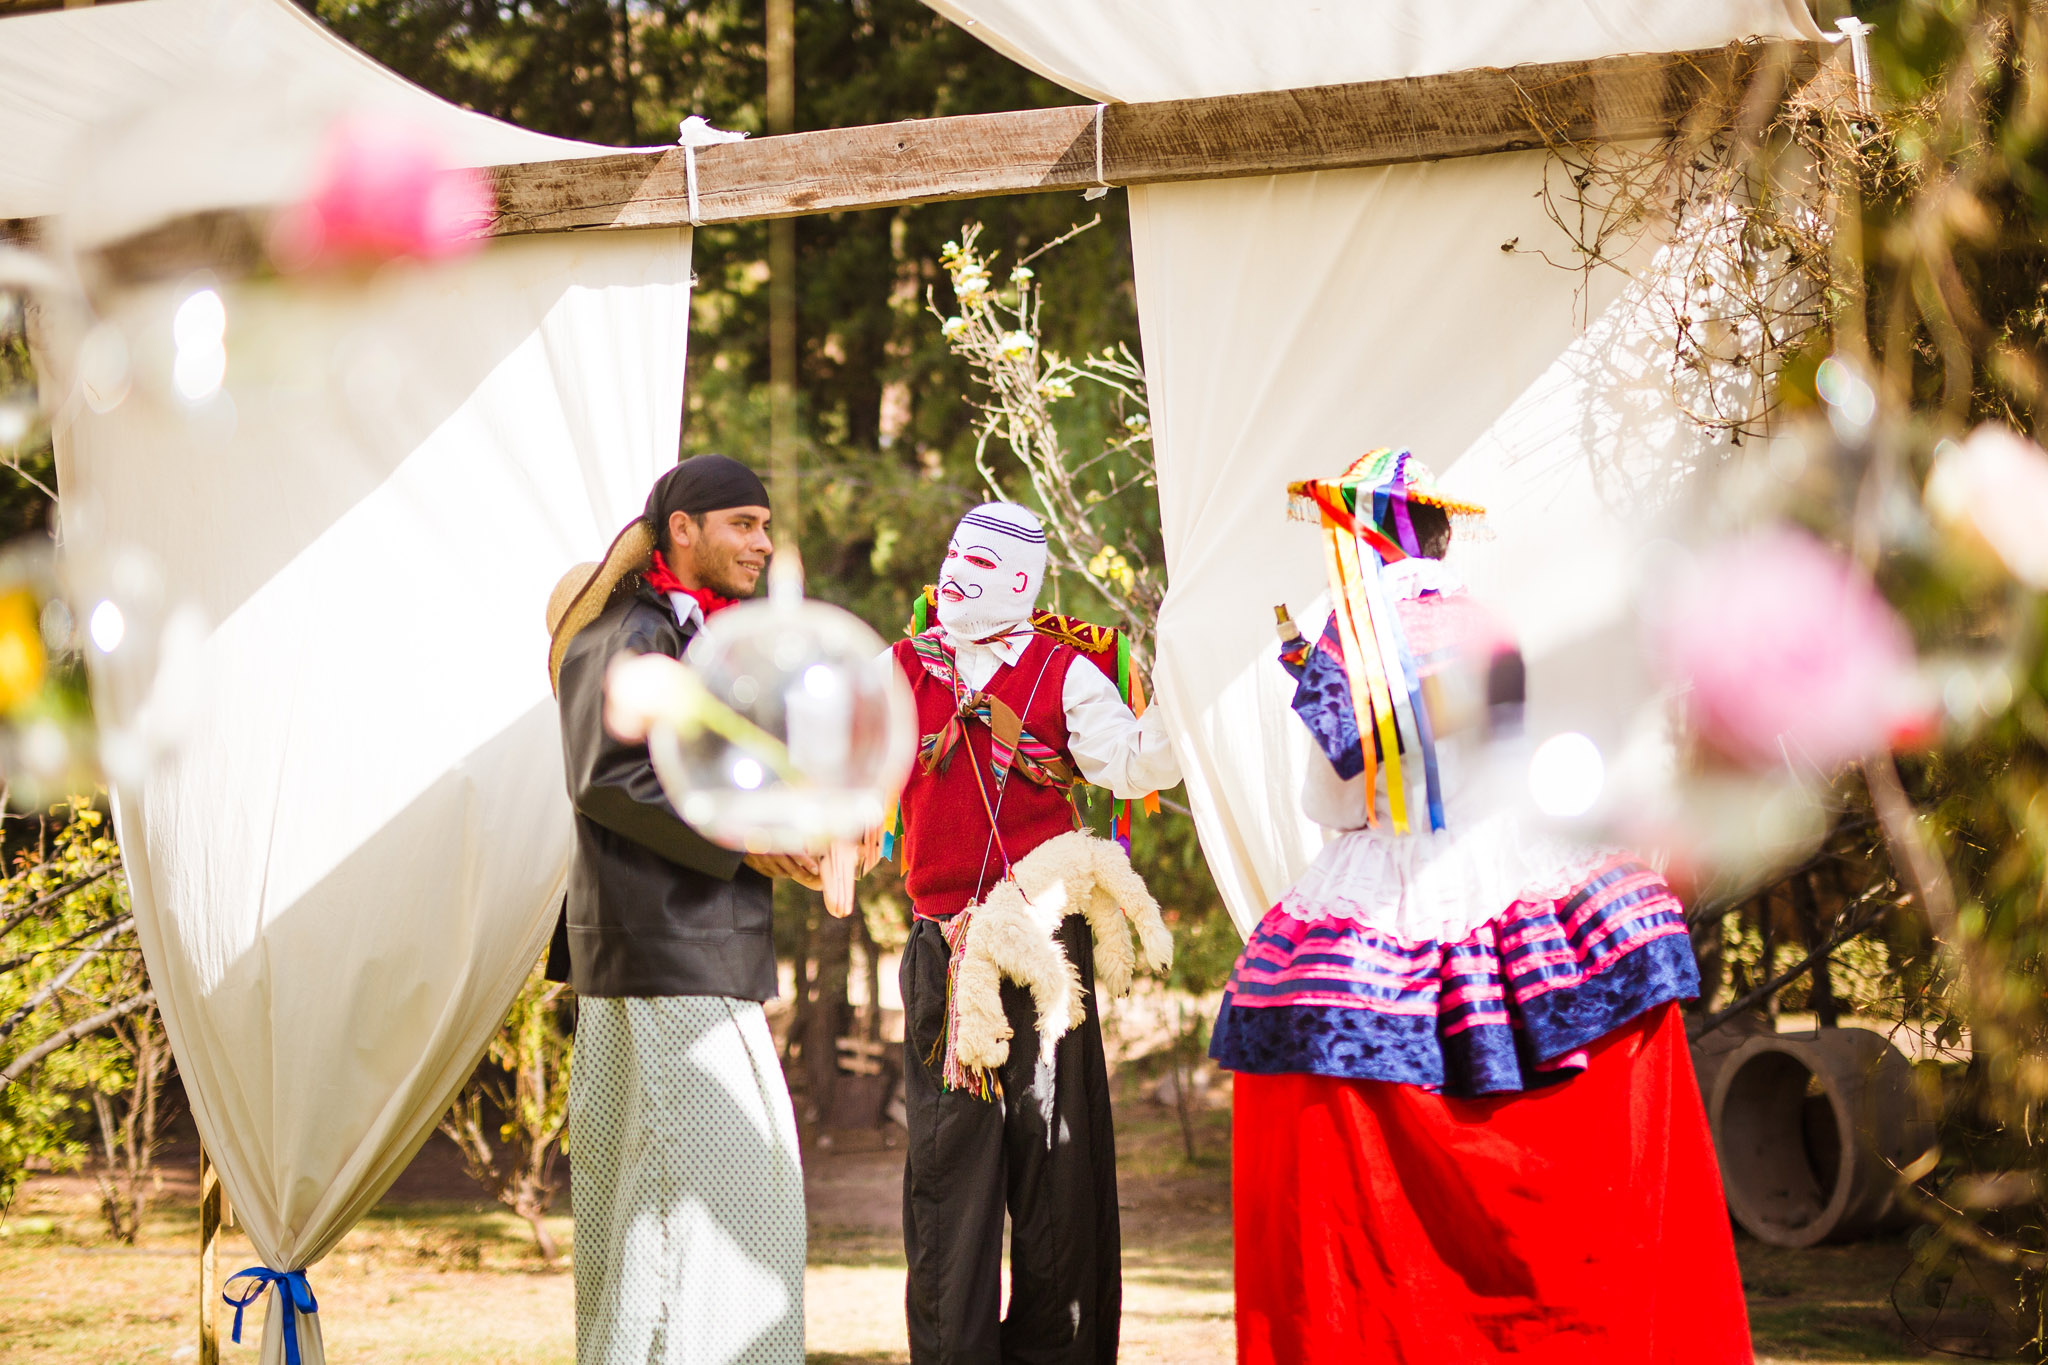 Wedding-Travellers-Destination-Wedding-Peru-Cusco-Hacienda-Sarapampa-Sacred-Valley-traditional-costumes-amusement-entertainment